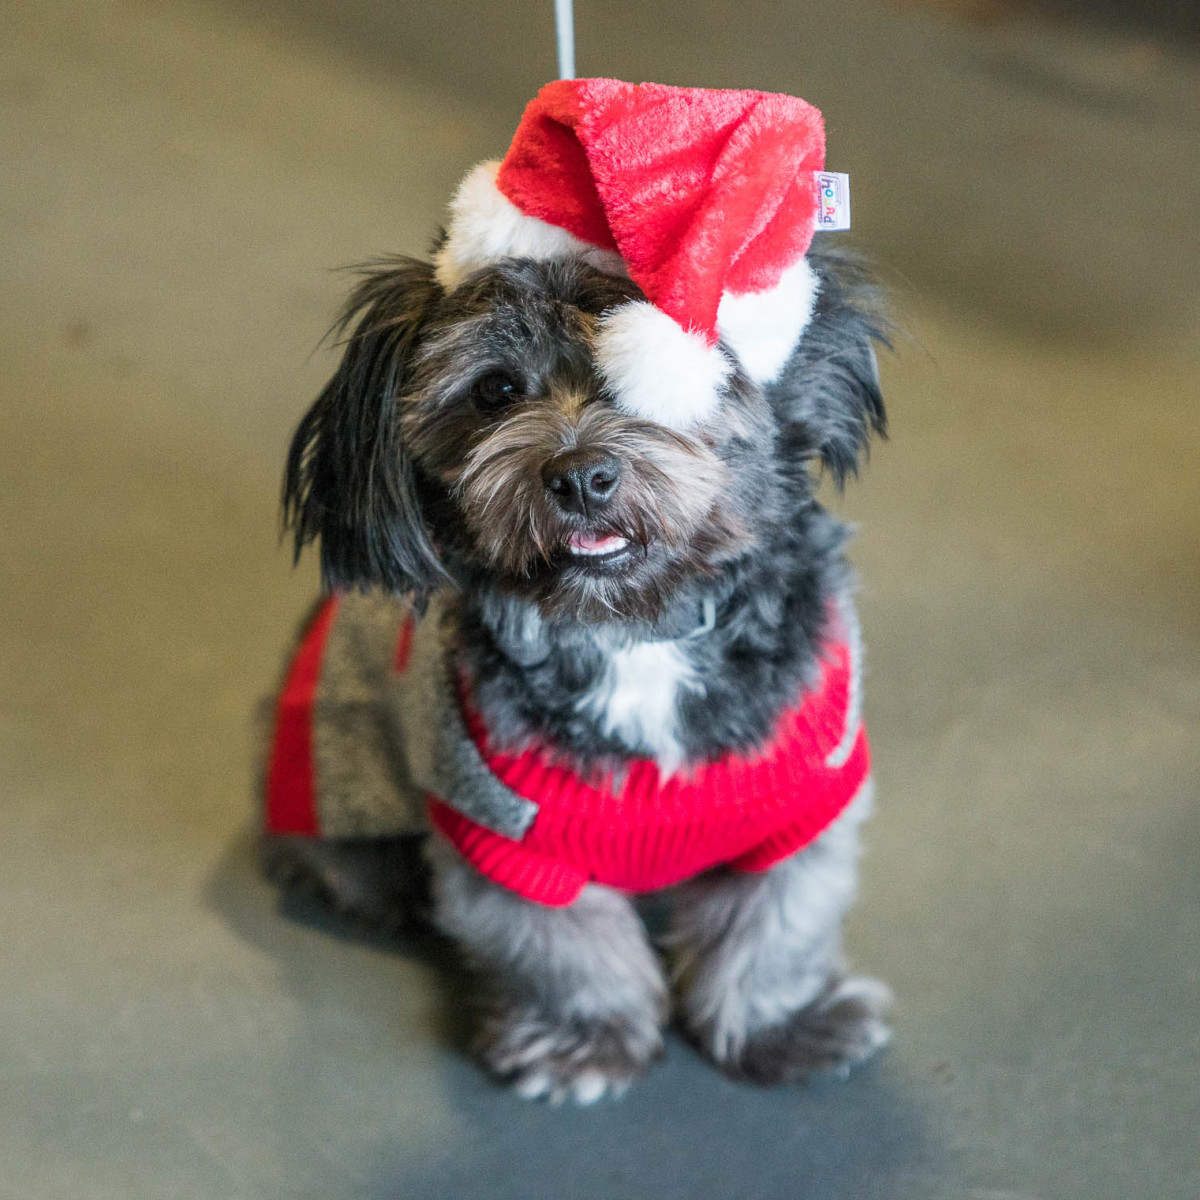 Frost Austin Eastcider Pup-a-palooza